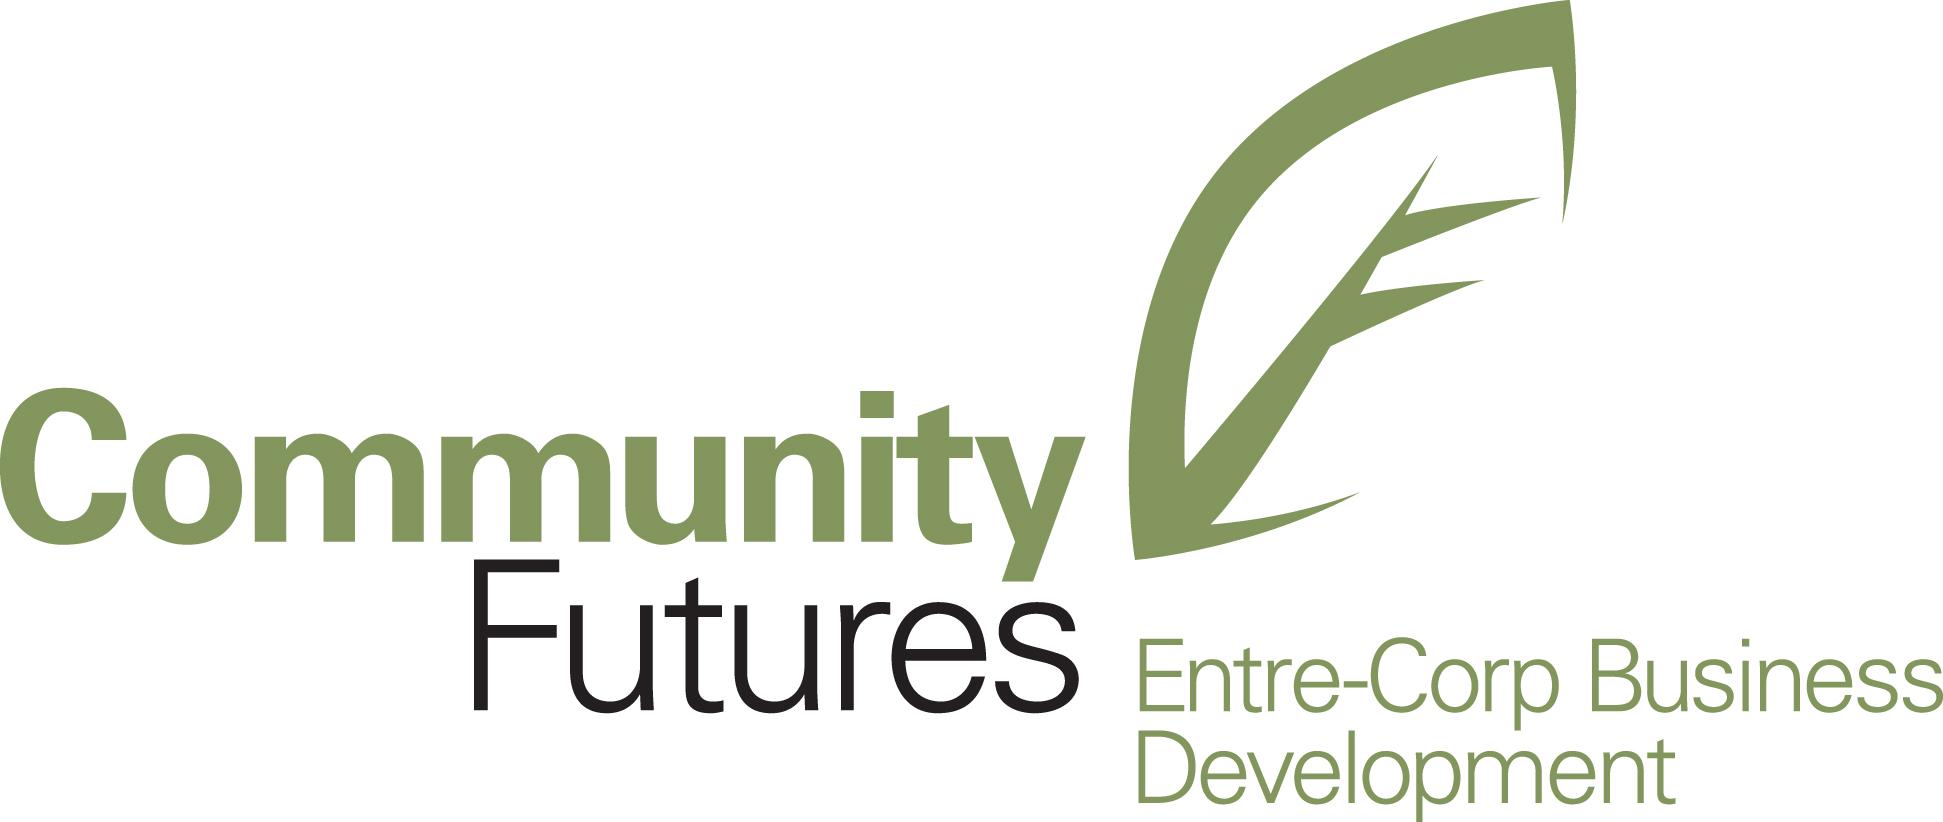 Entrecorp logo.jpg